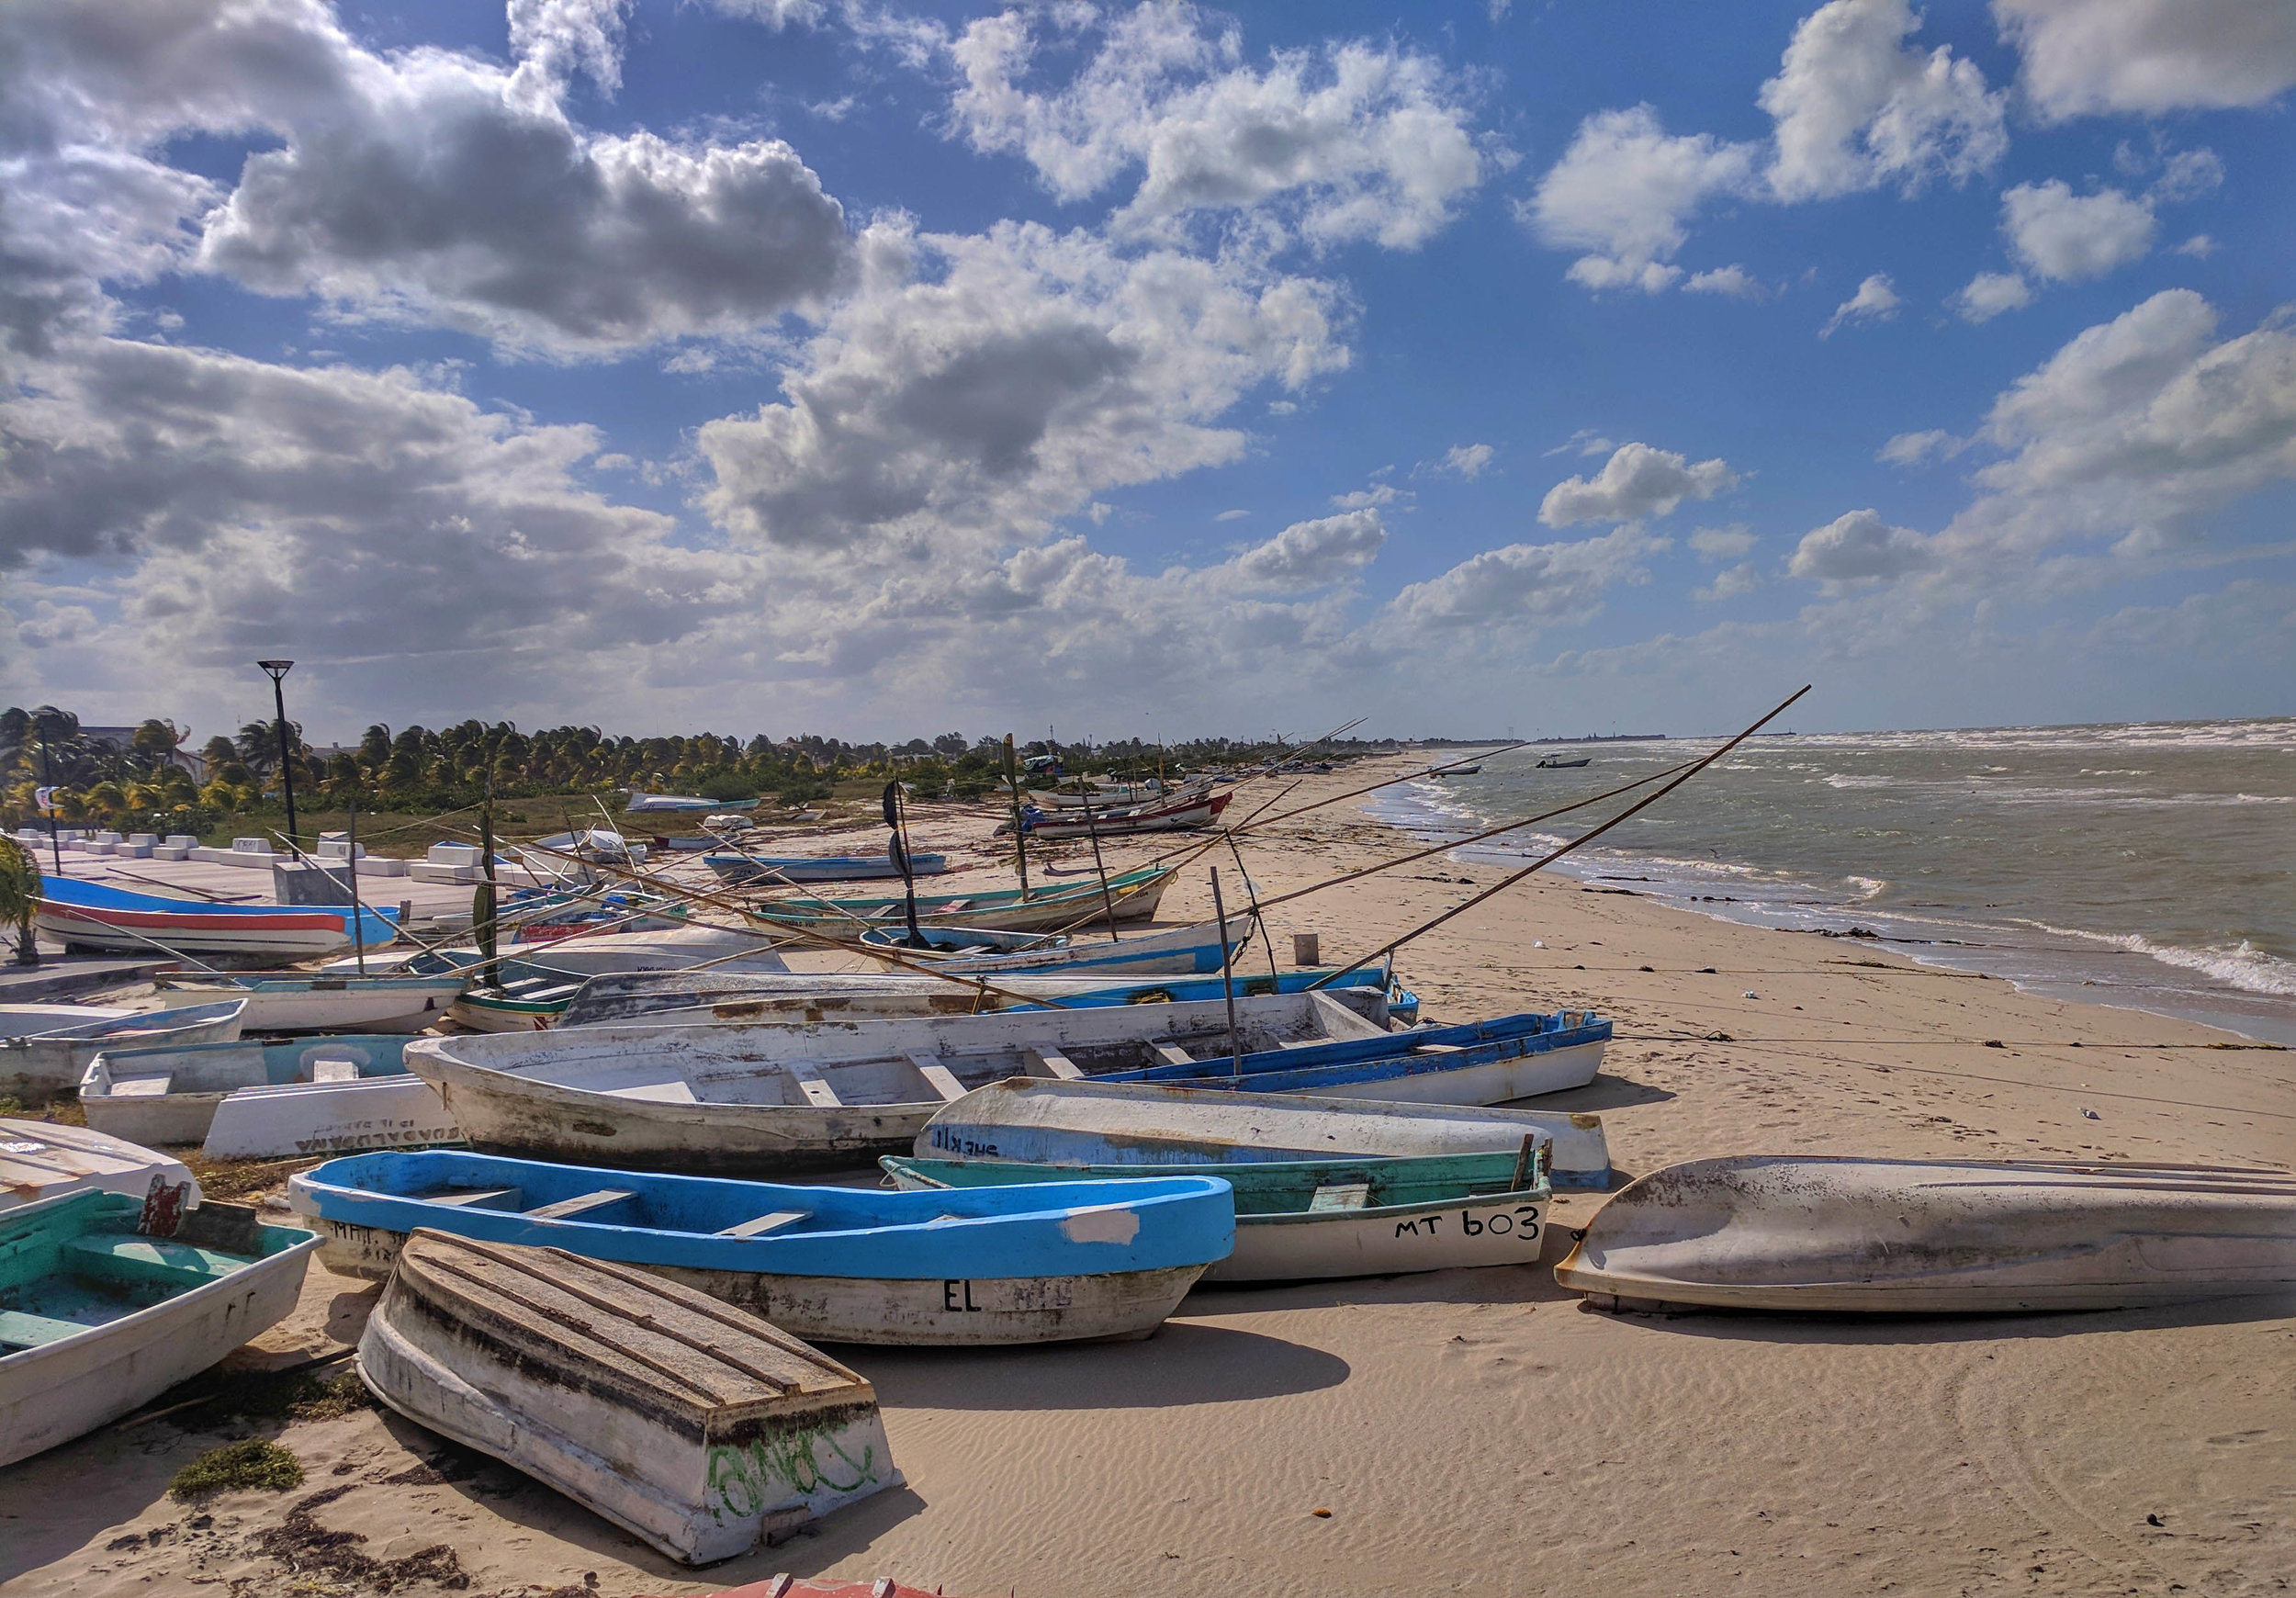 Boats on beach at Progresso.jpg